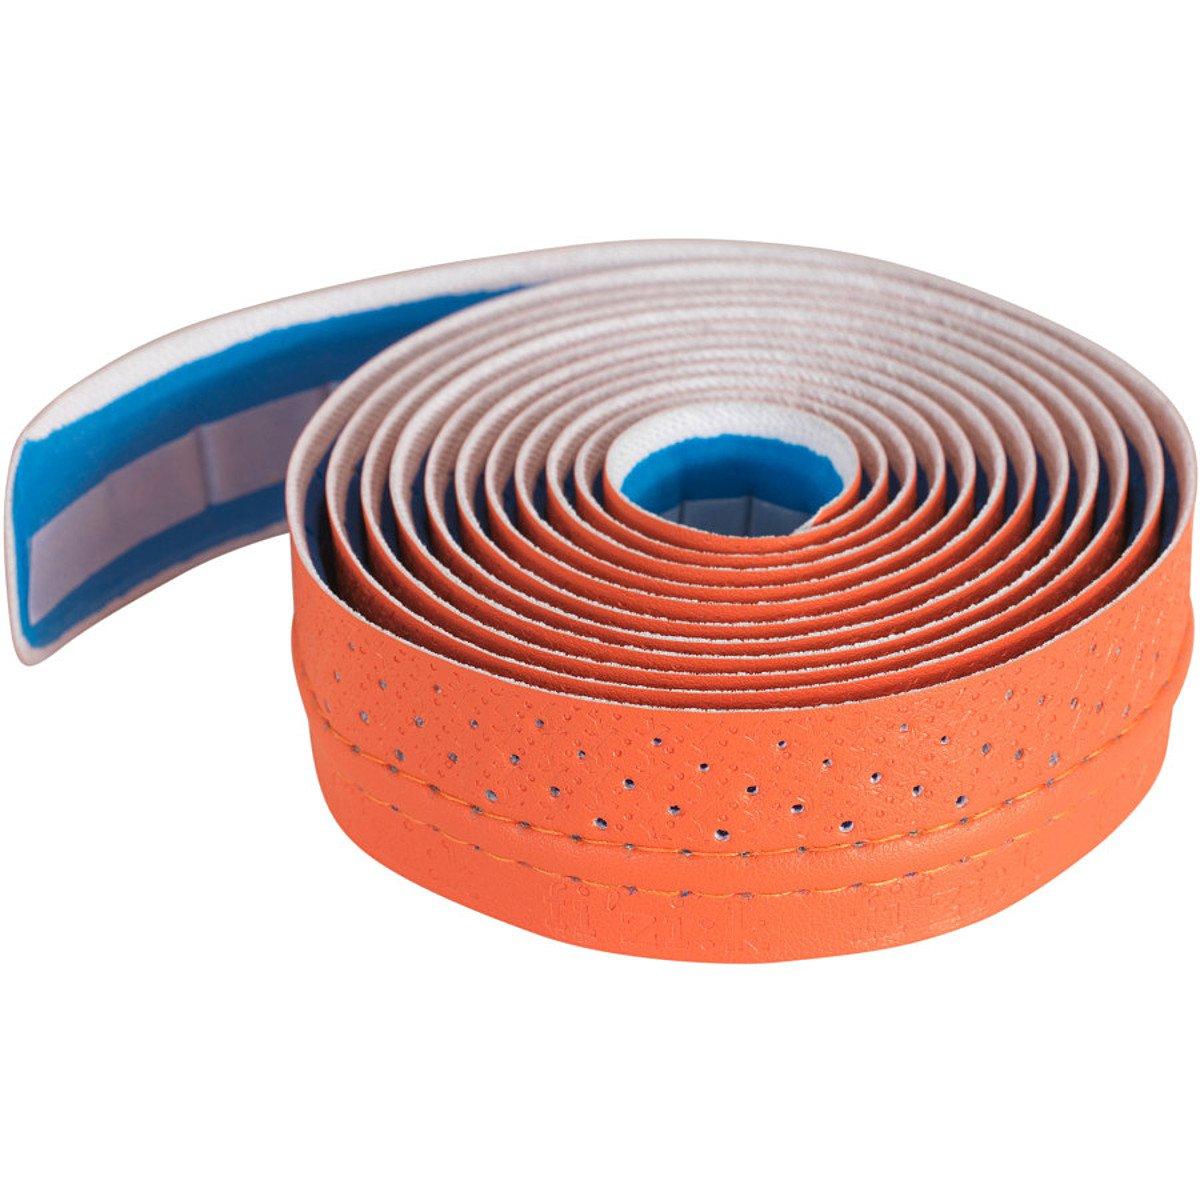 Fizik Performance Bar Tape Orange 3mm Sports Outdoors Introduction To 7400 Series Digital Logic Devices Fizix